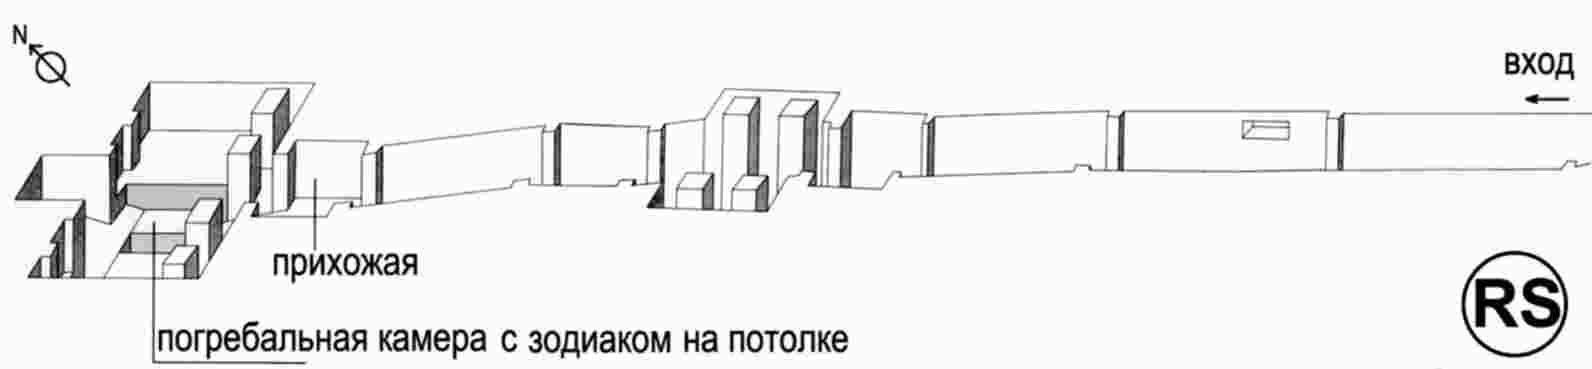 http://sd.uploads.ru/stlIY.jpg